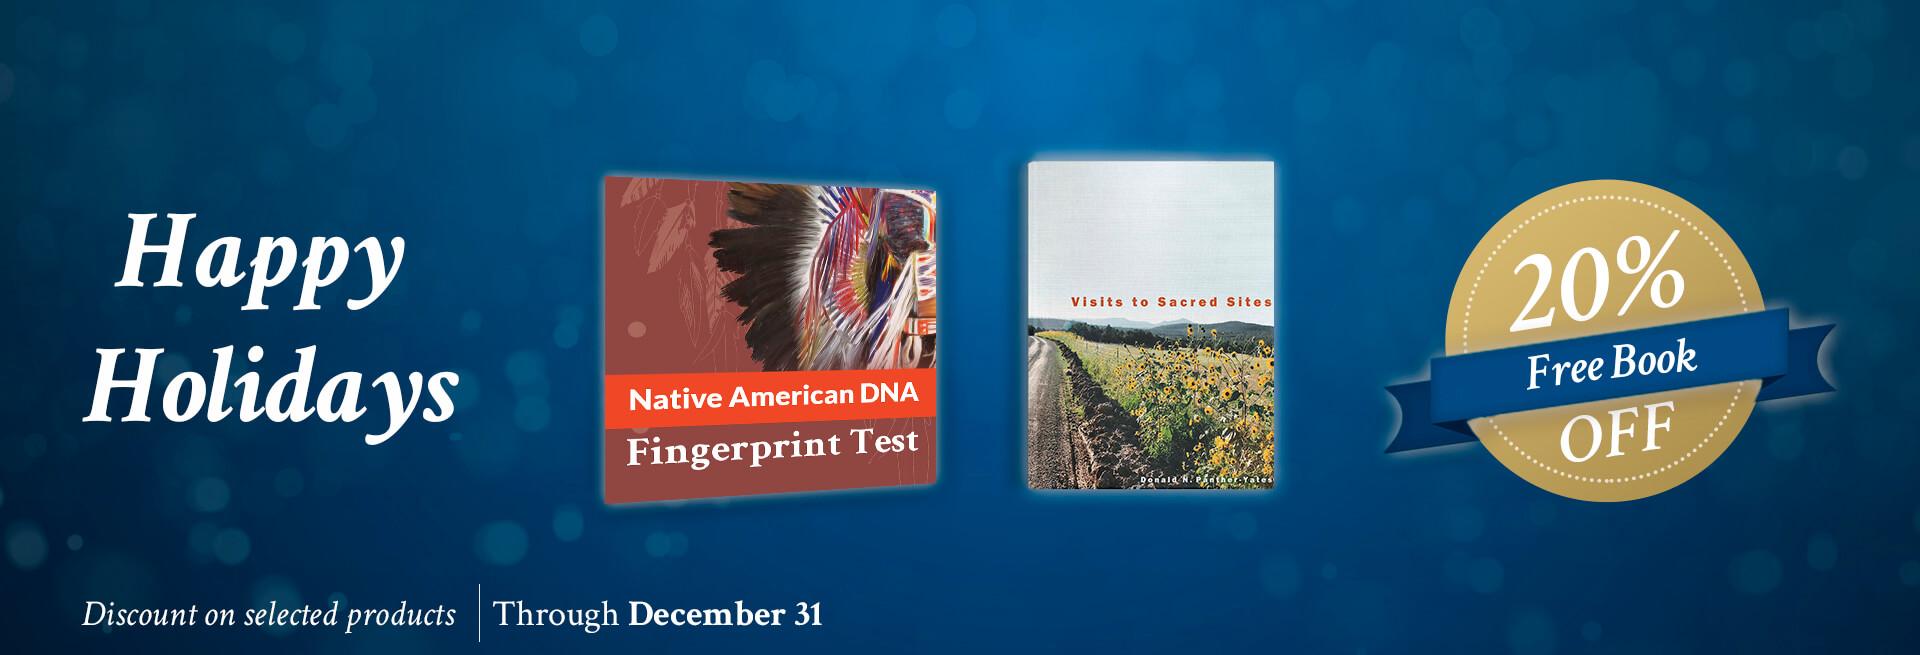 Native American DNA Fingerprint Happy Holiday promo 2019